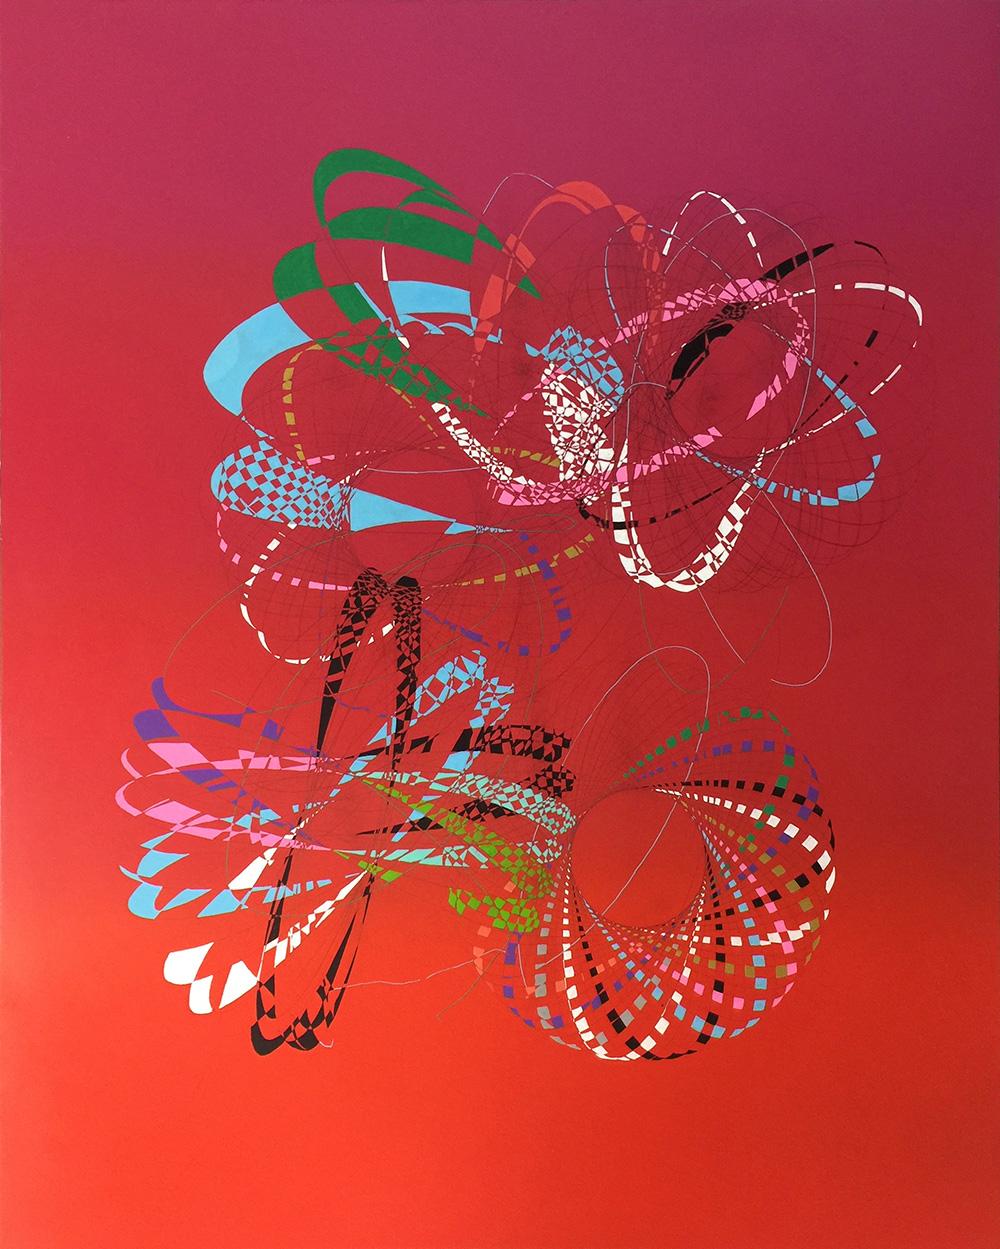 MARK TITMARSH  In-A-Gadda-Da-Vida  acrylic, pencil and resin on aluminium 110 ×90 cm